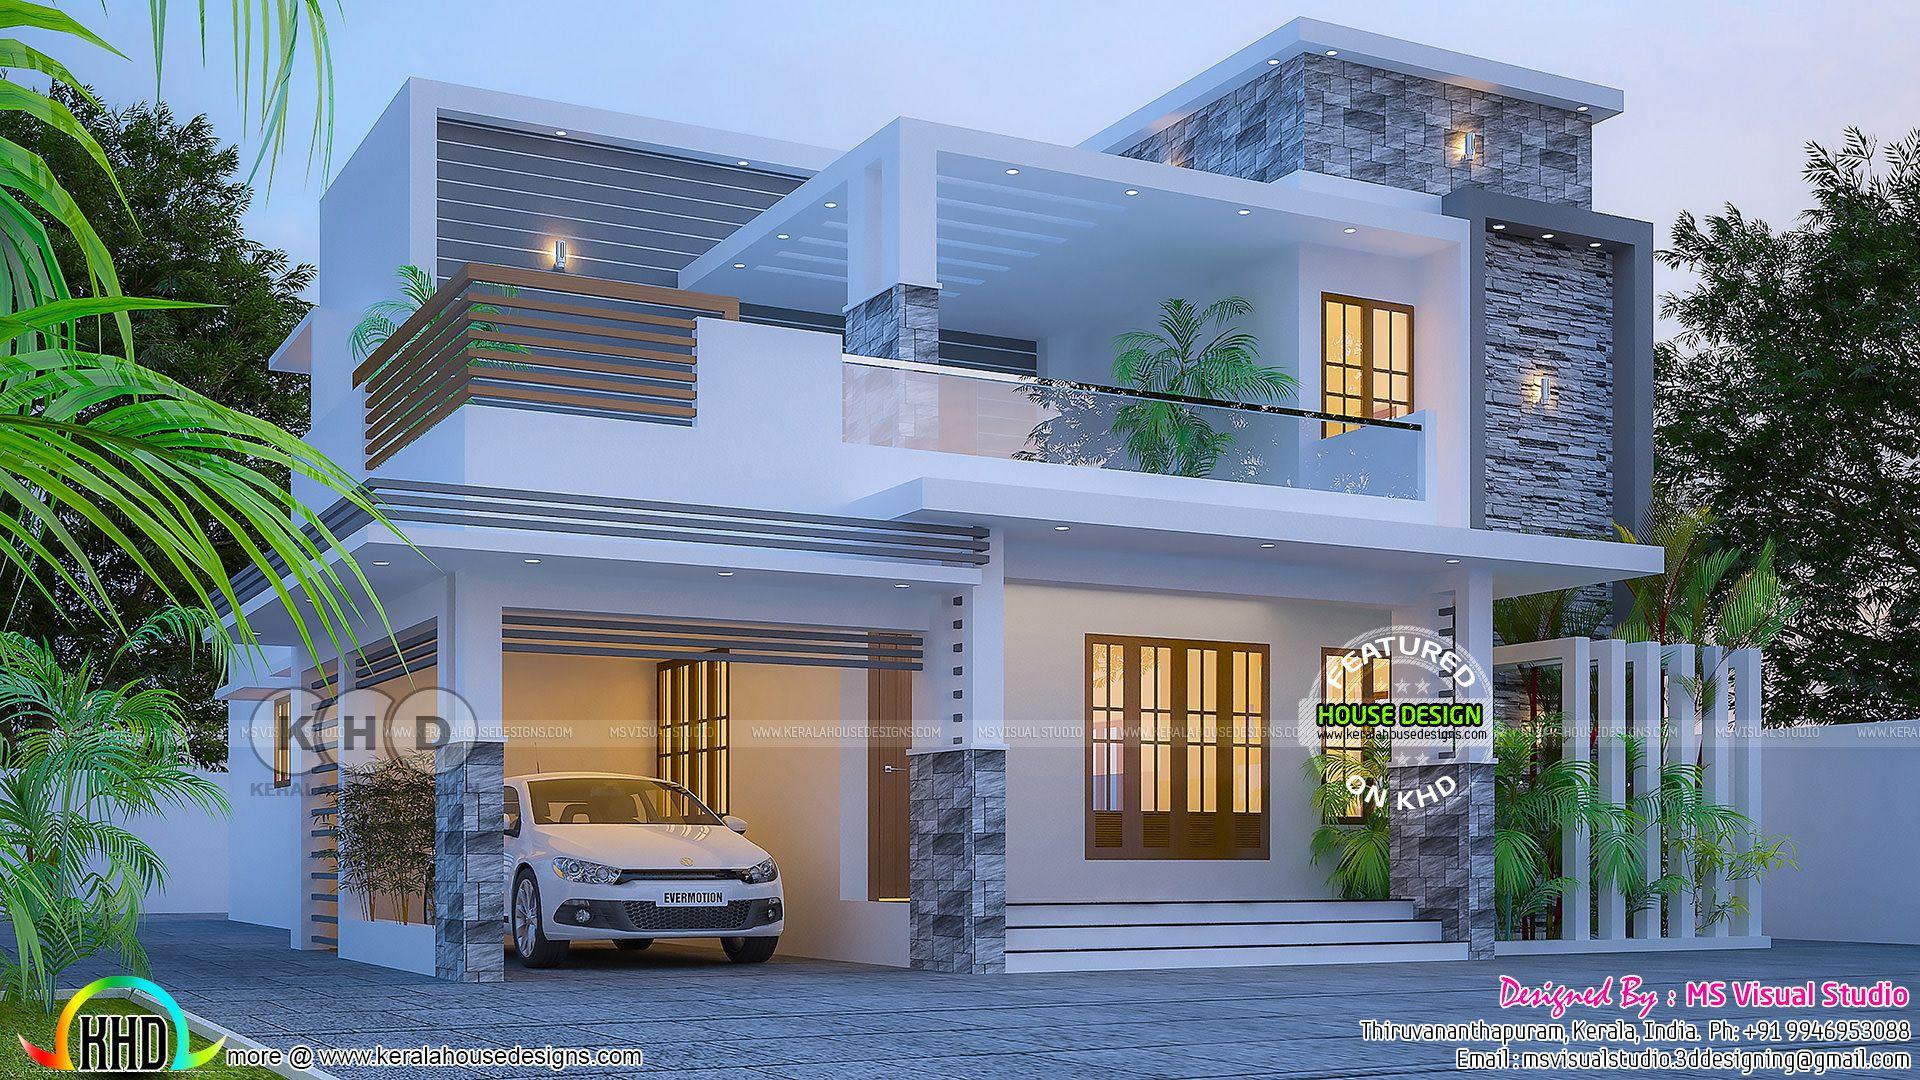 4 Bhk Stunning 2182 Square Feet Home Design Kerala House Design House Front Design Bungalow House Design